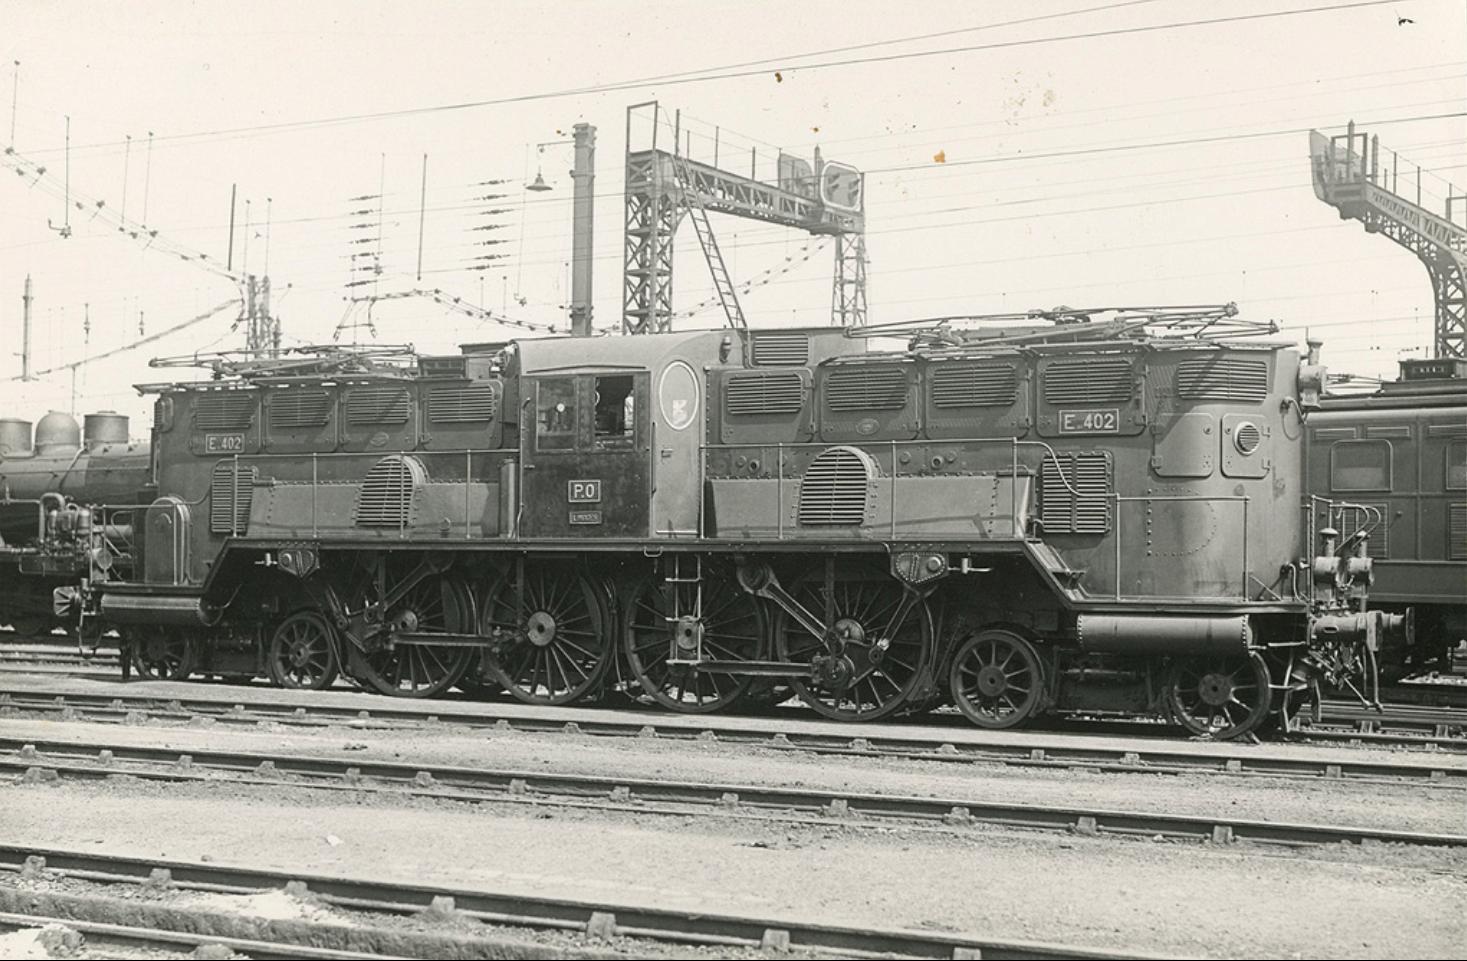 1930 GANZ mozdony a Párizs-Orleans vonalon.jpg